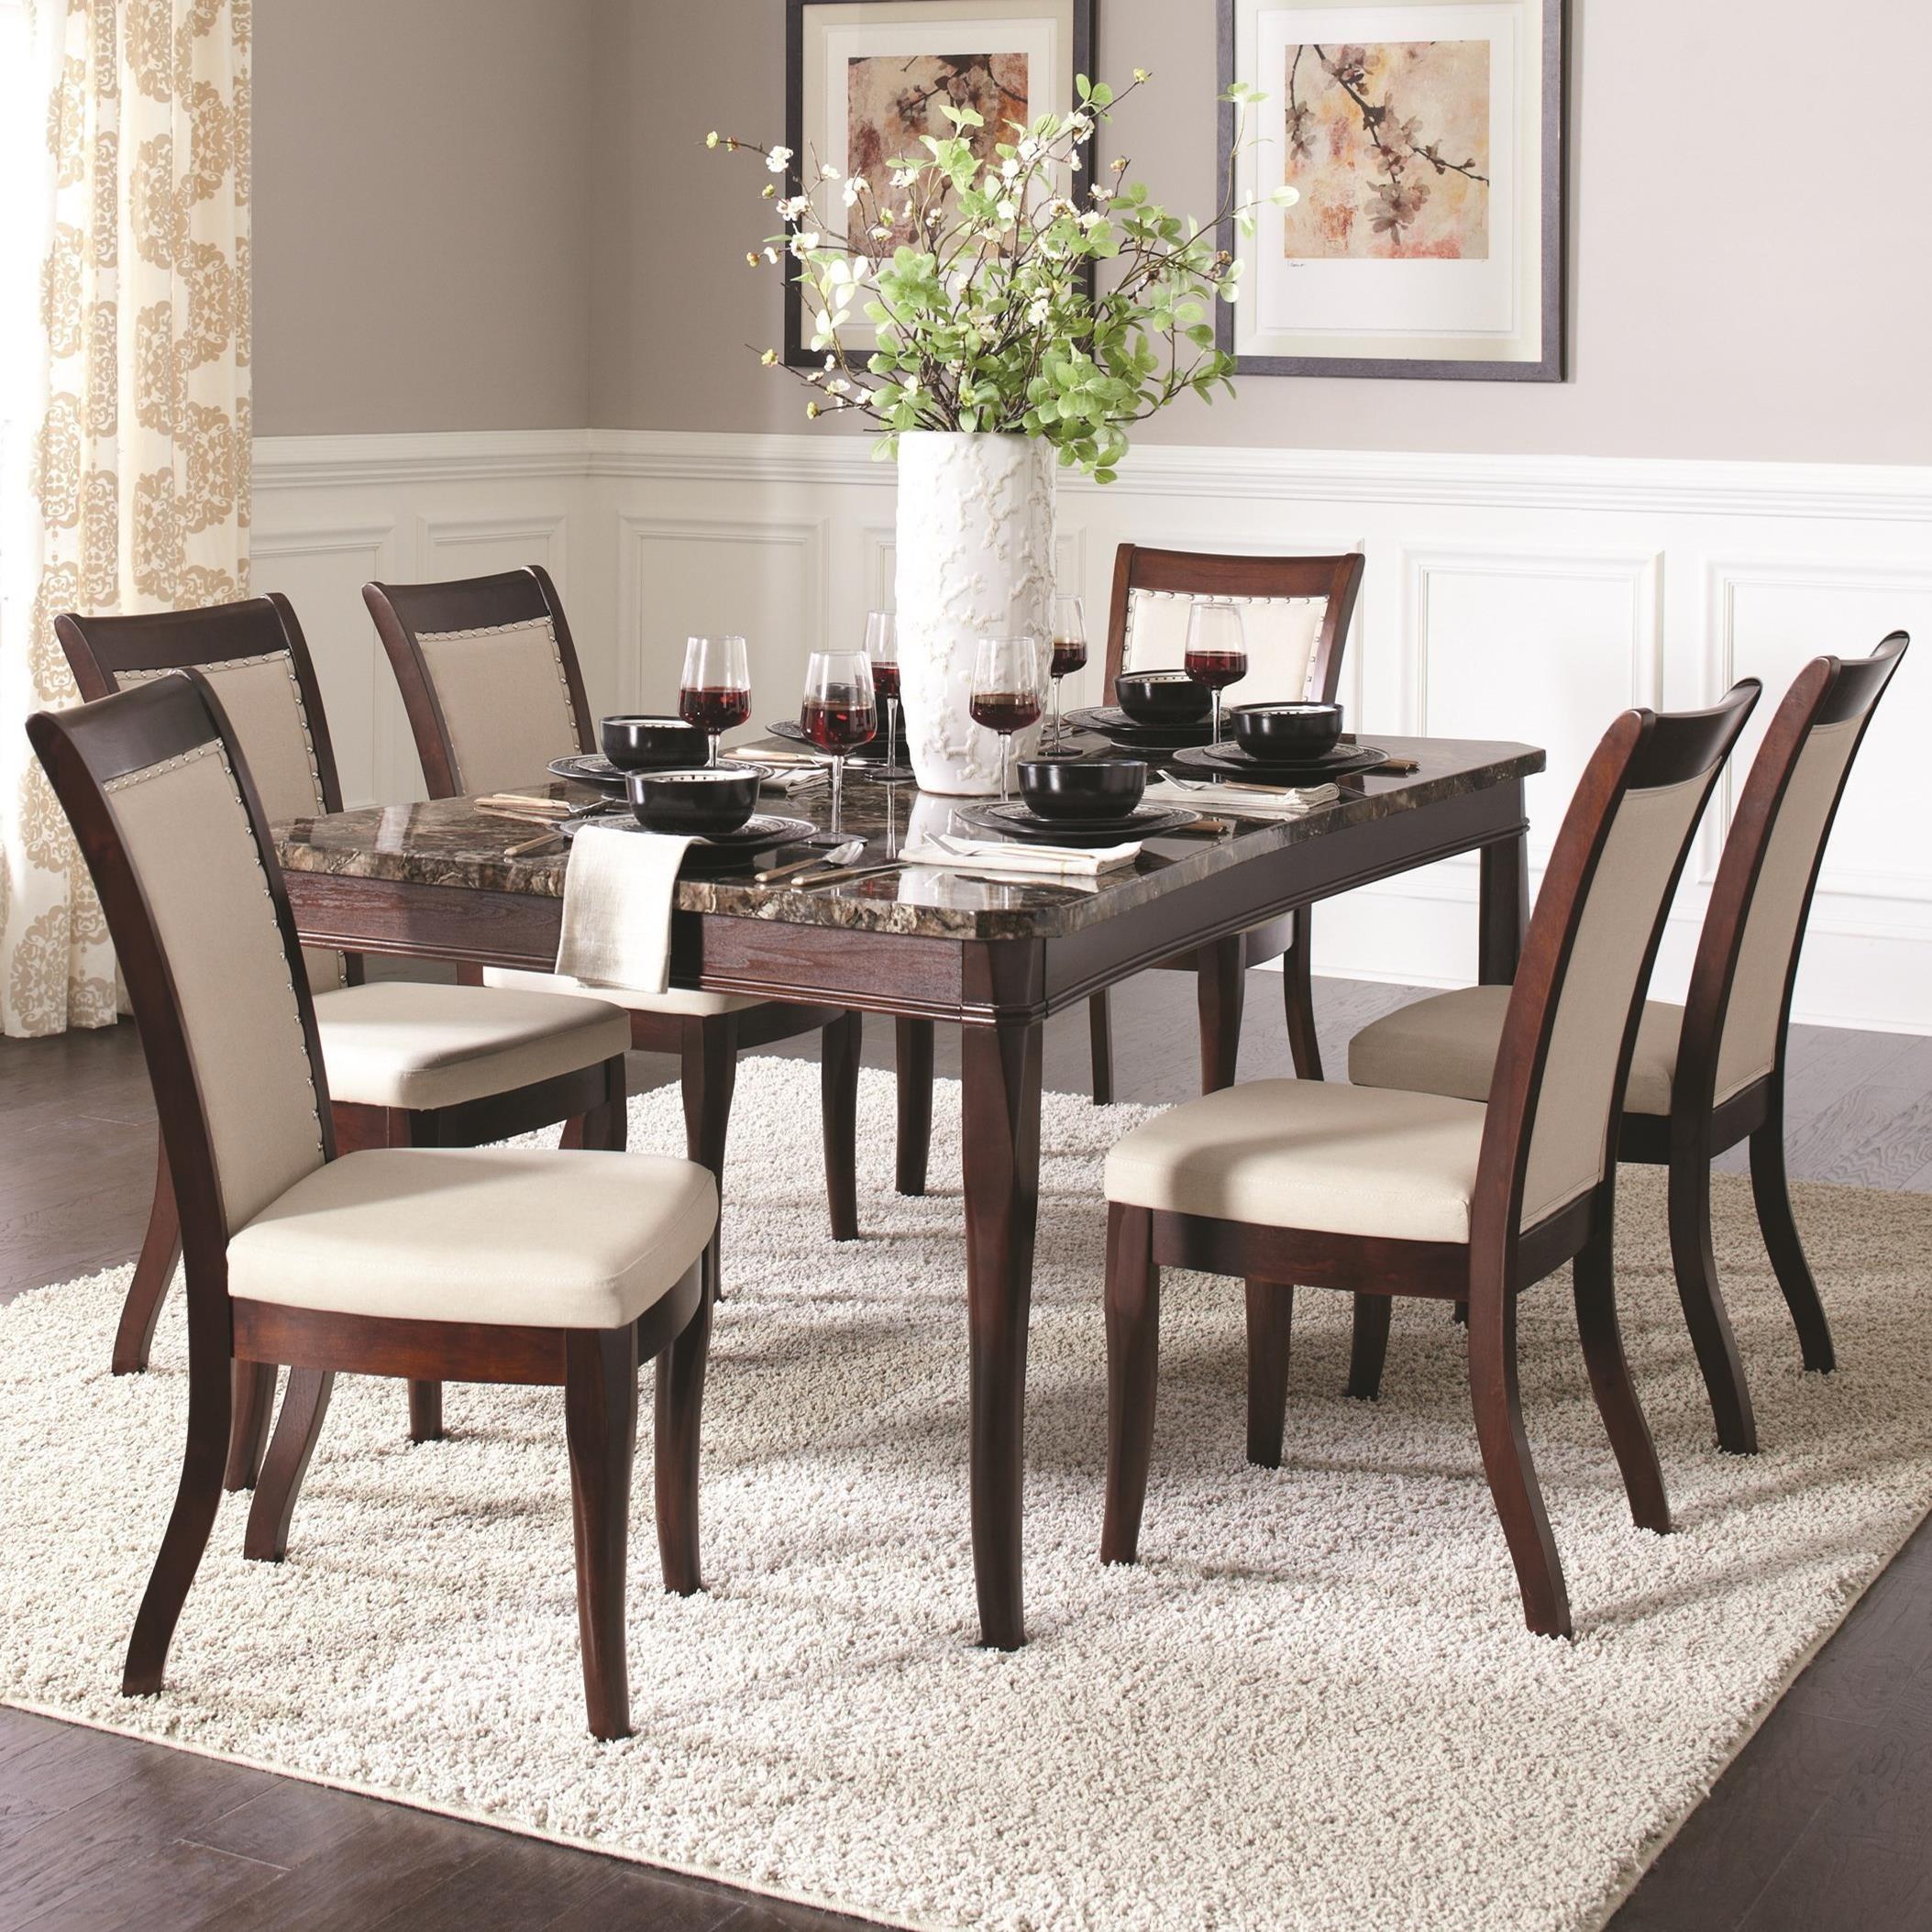 Coaster Carone Contemporary Glam Dining Room Set With: Fine Furniture Cornett 7 Piece Dining Set